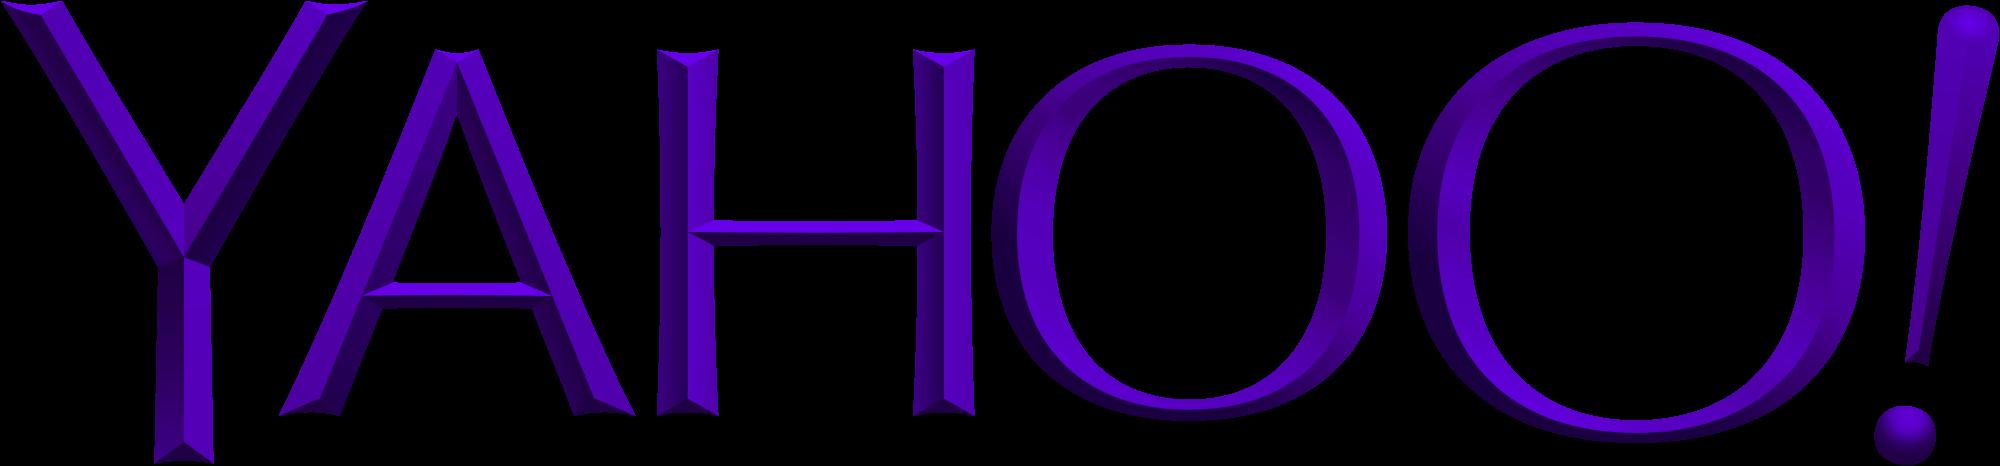 Yahoo! Screen